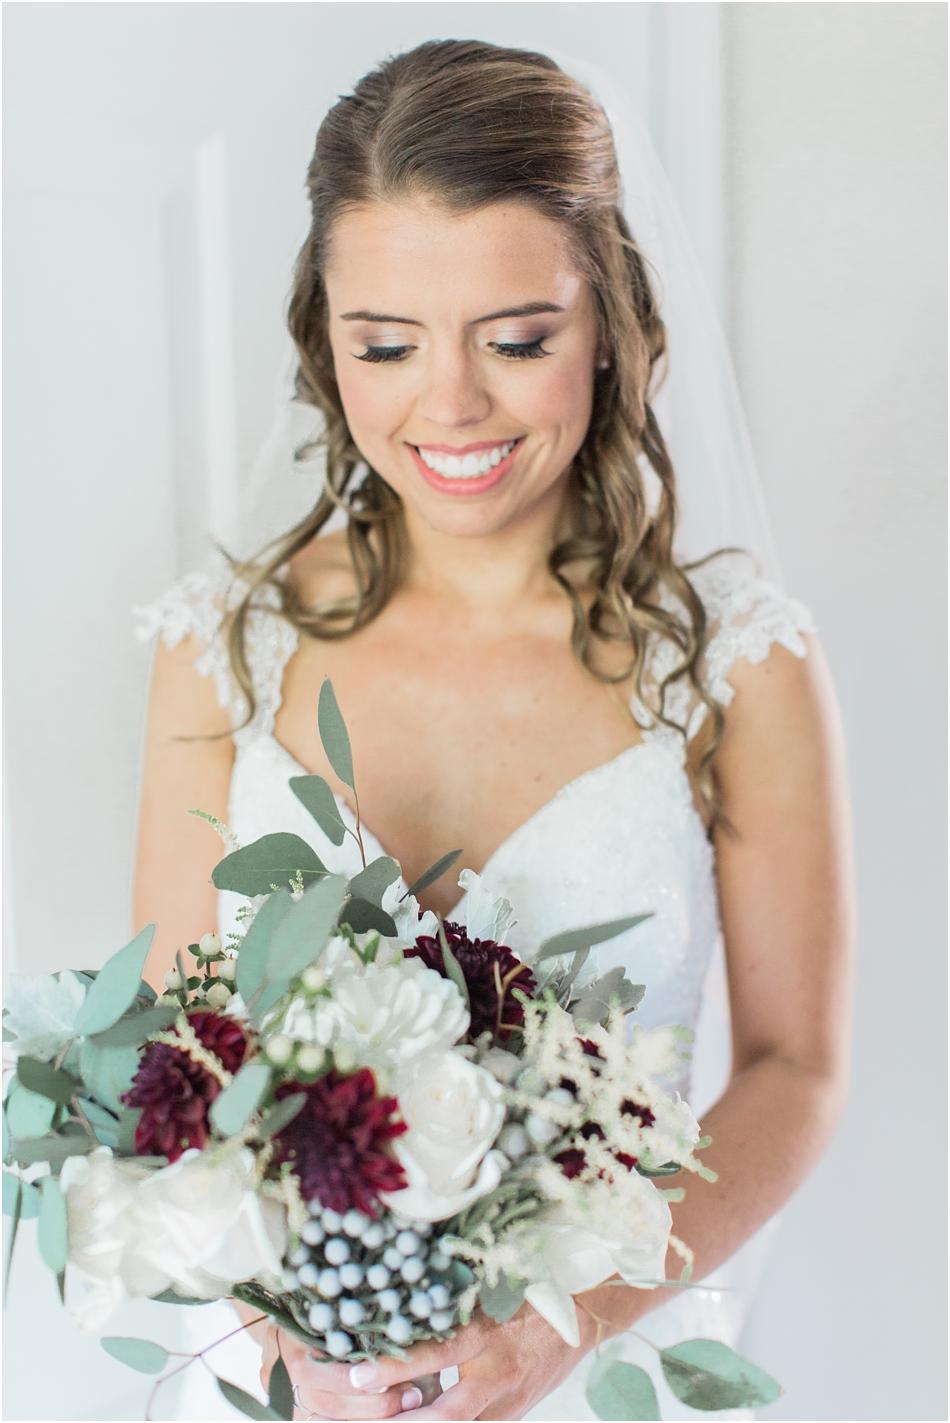 south_shore_country_club_hingham_amanda_chris_cape_cod_boston_new_england_wedding_photographer_Meredith_Jane_Photography_photo_2704.jpg